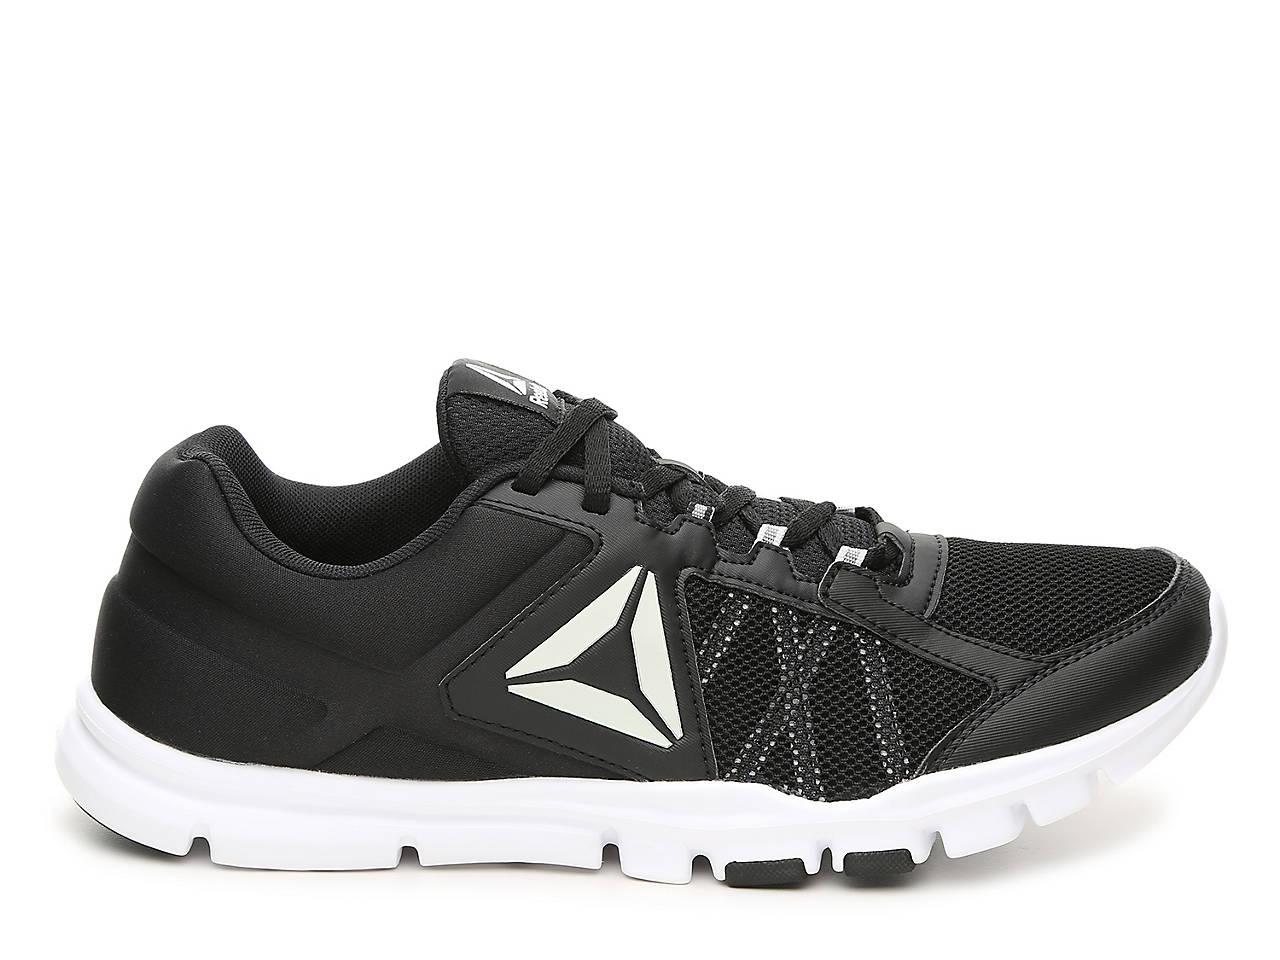 Reebok YourFlex Train 9.0 MT Lightweight Training Shoe